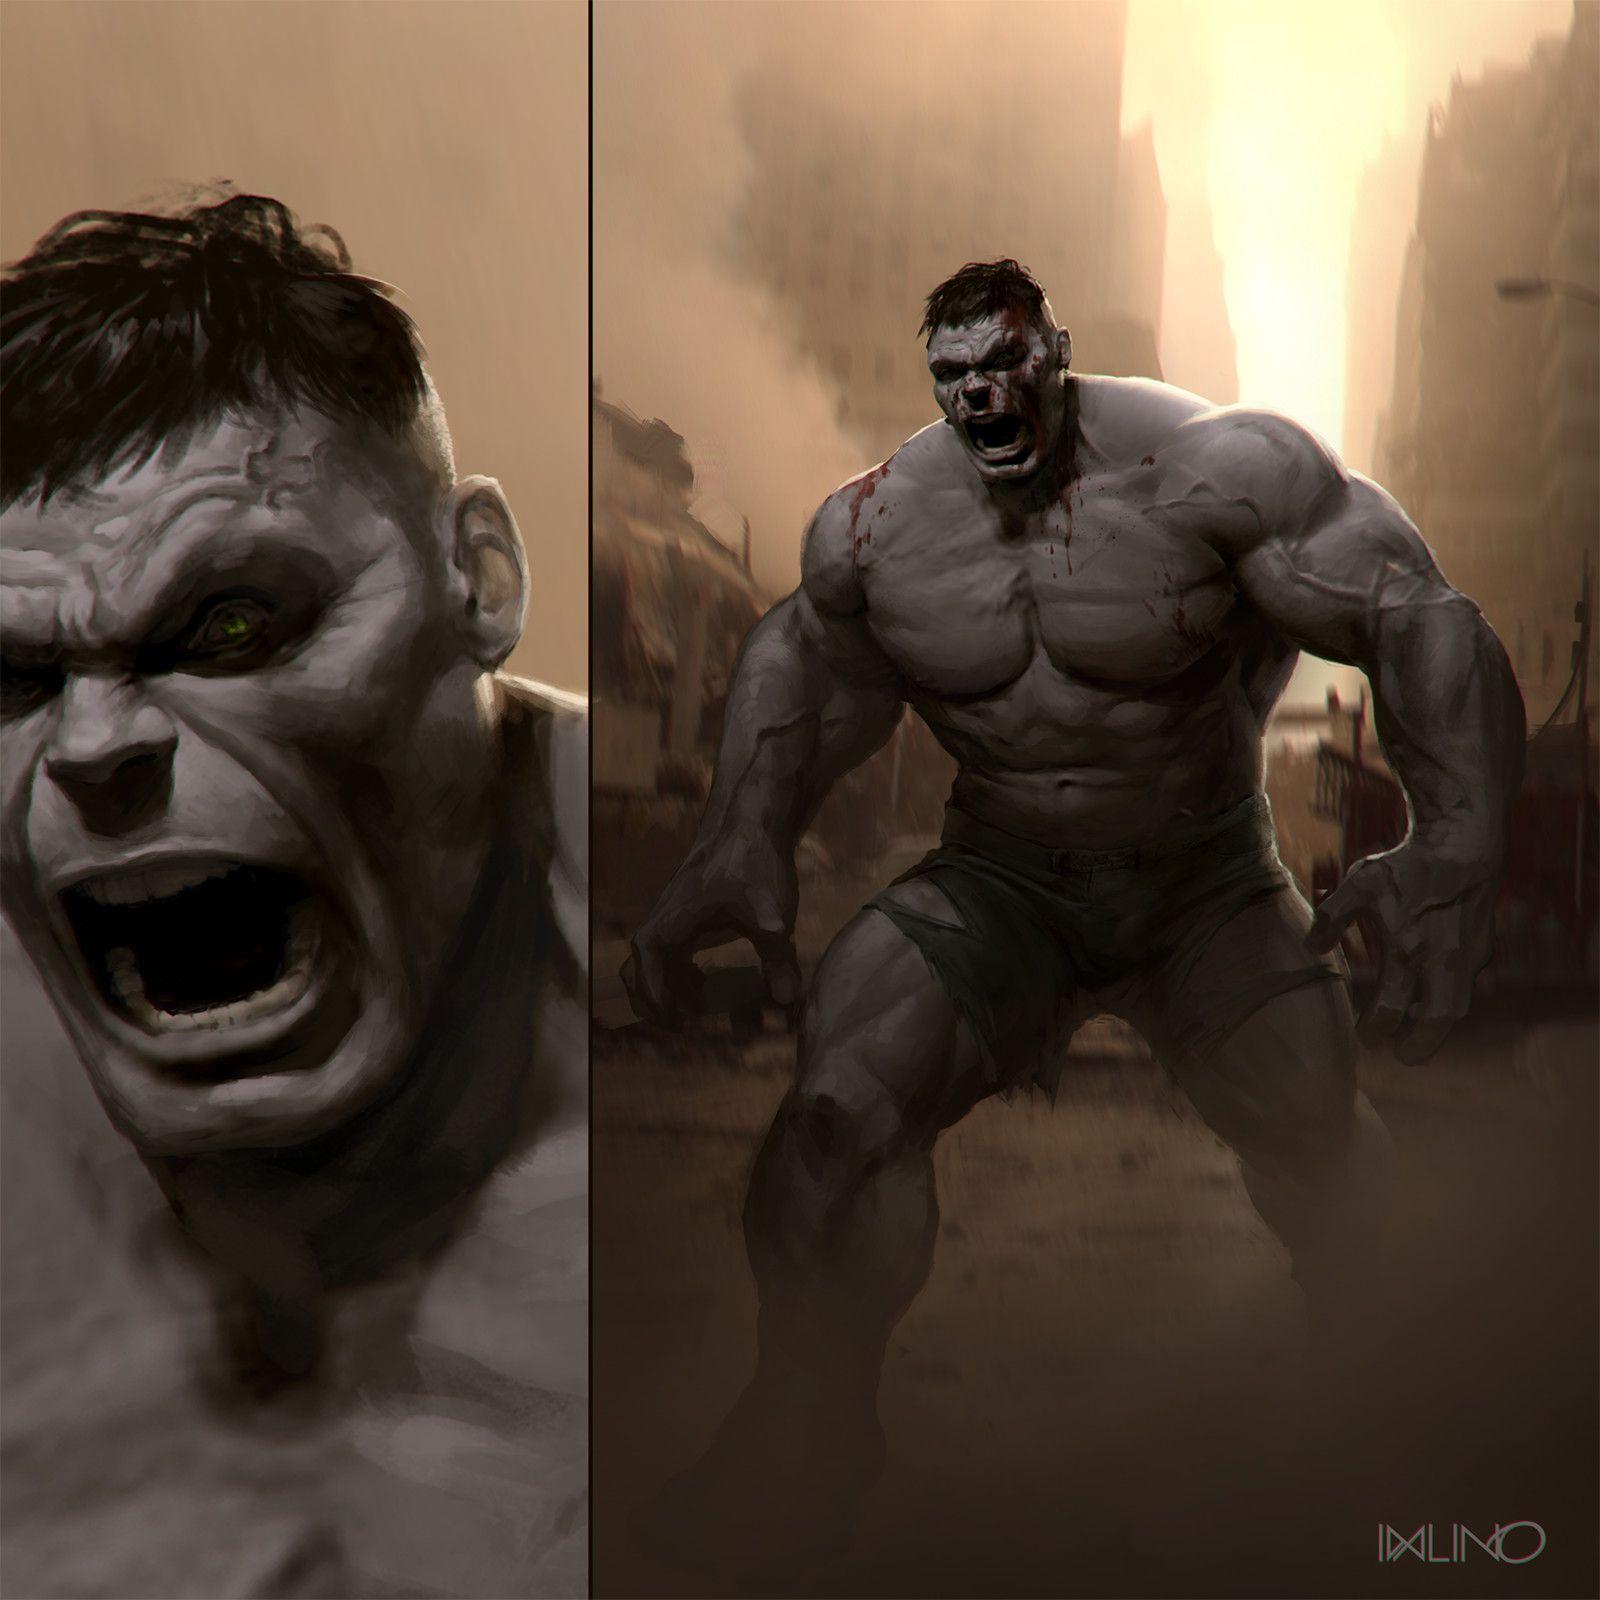 #Hulk #Fan #Art. (Gray Hulk) By: Aaron Sims (Creative challenge entry, Rodrigo Idalino) ÅWESOMENESS!!!™ ÅÅÅ+